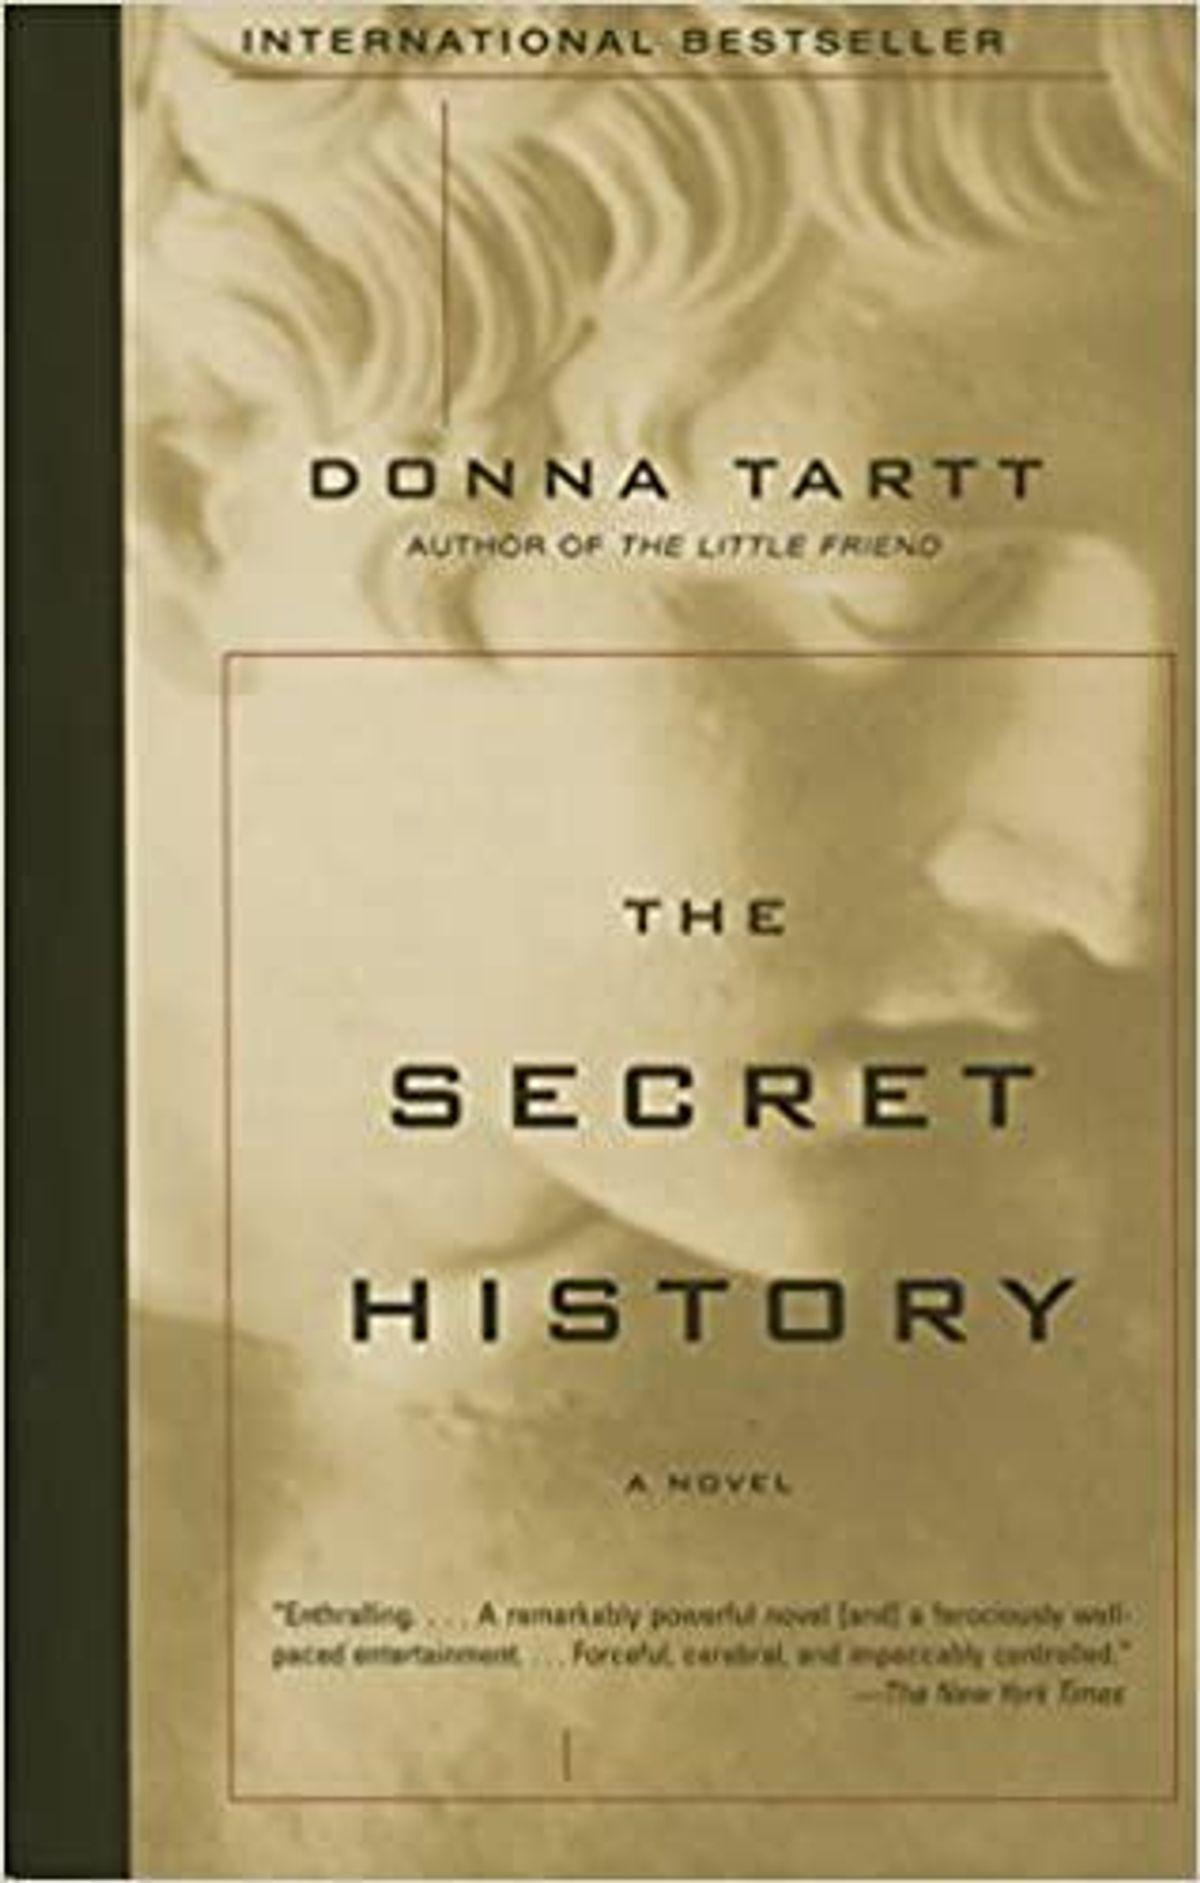 The Secret History by Donna Tart